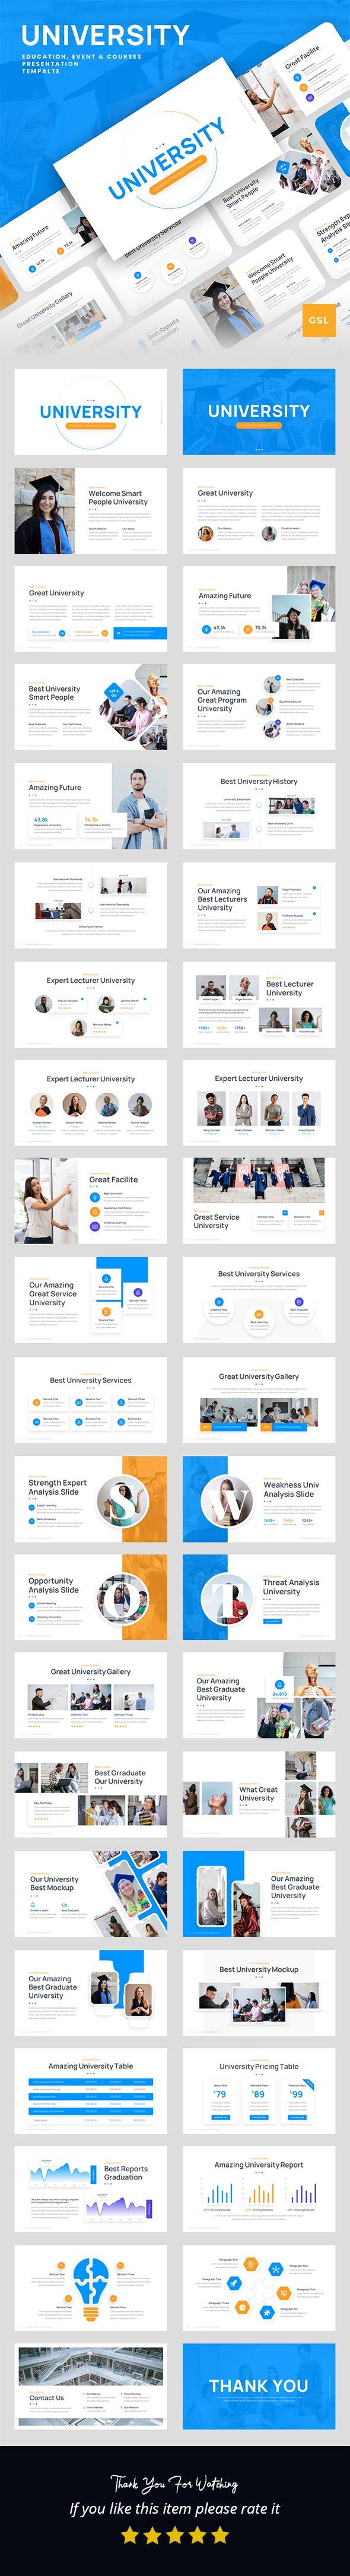 University - Education, Event & Course Google Slides Presentation Template - Google Slides Presentation Templates